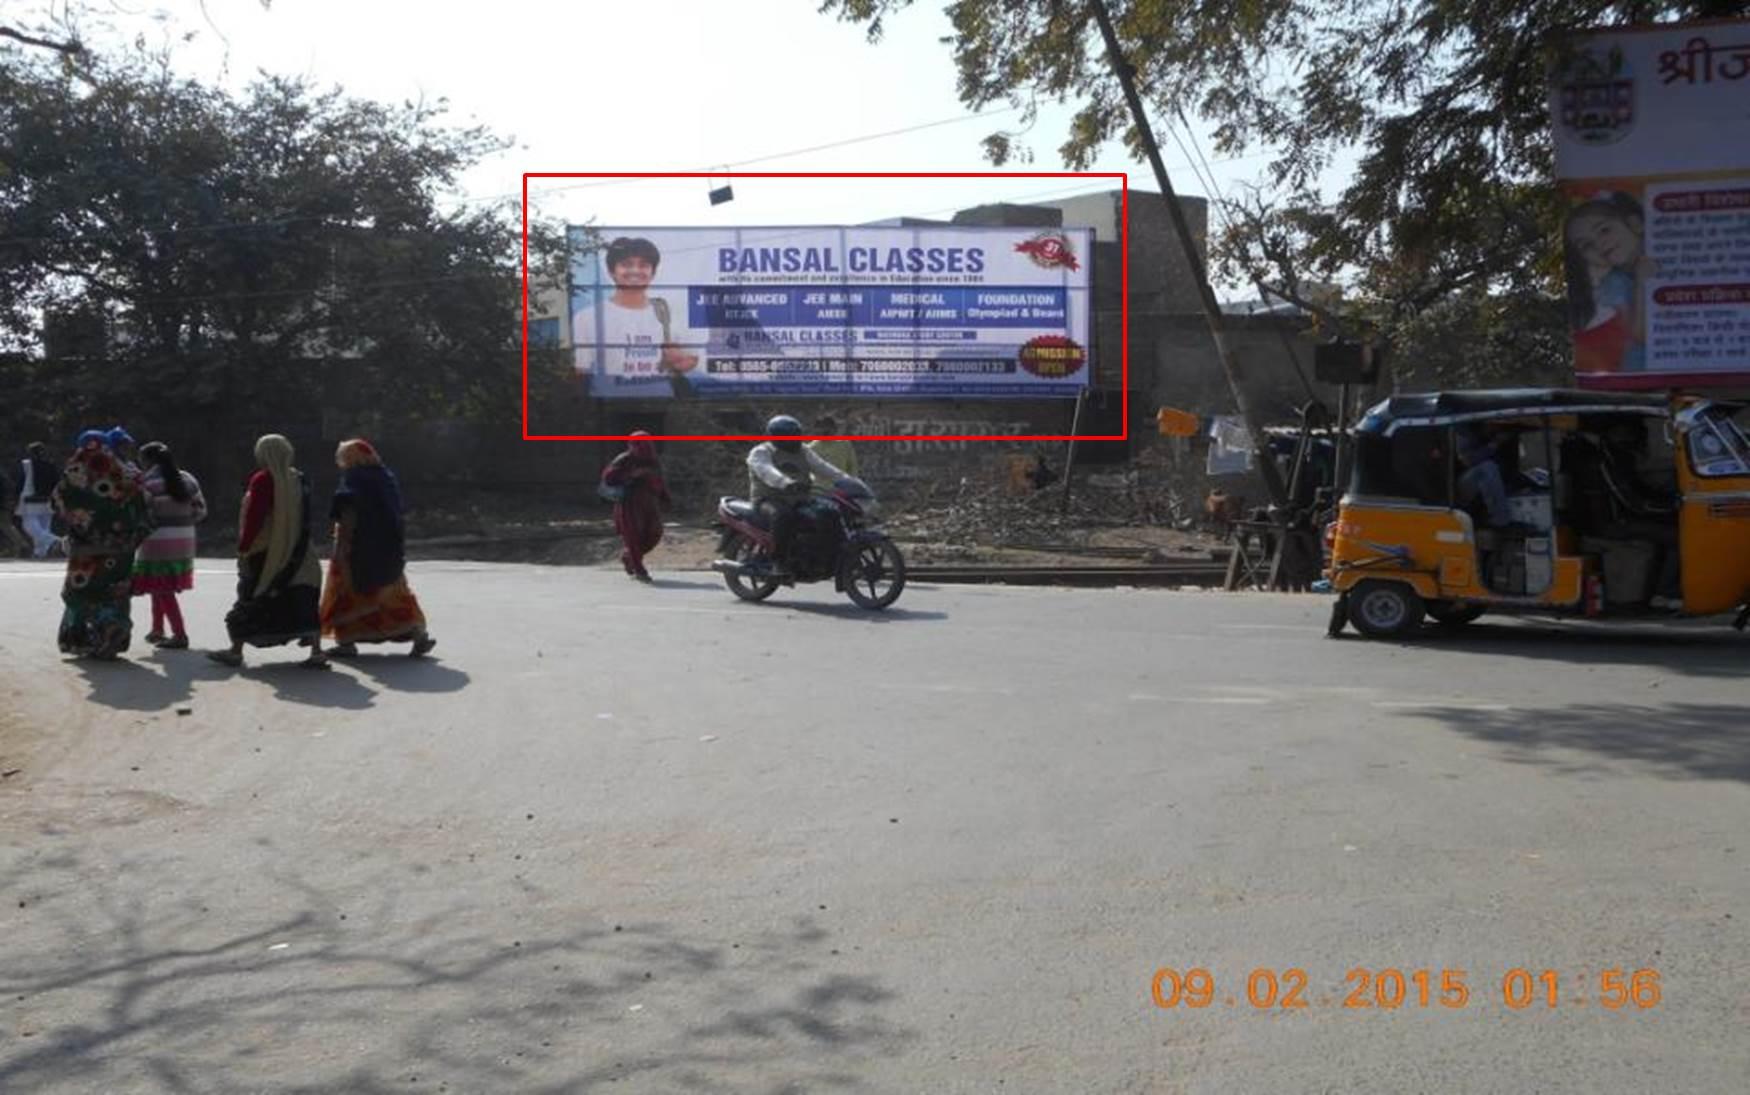 Shonkh Adda Railway Fhatak,Mathura